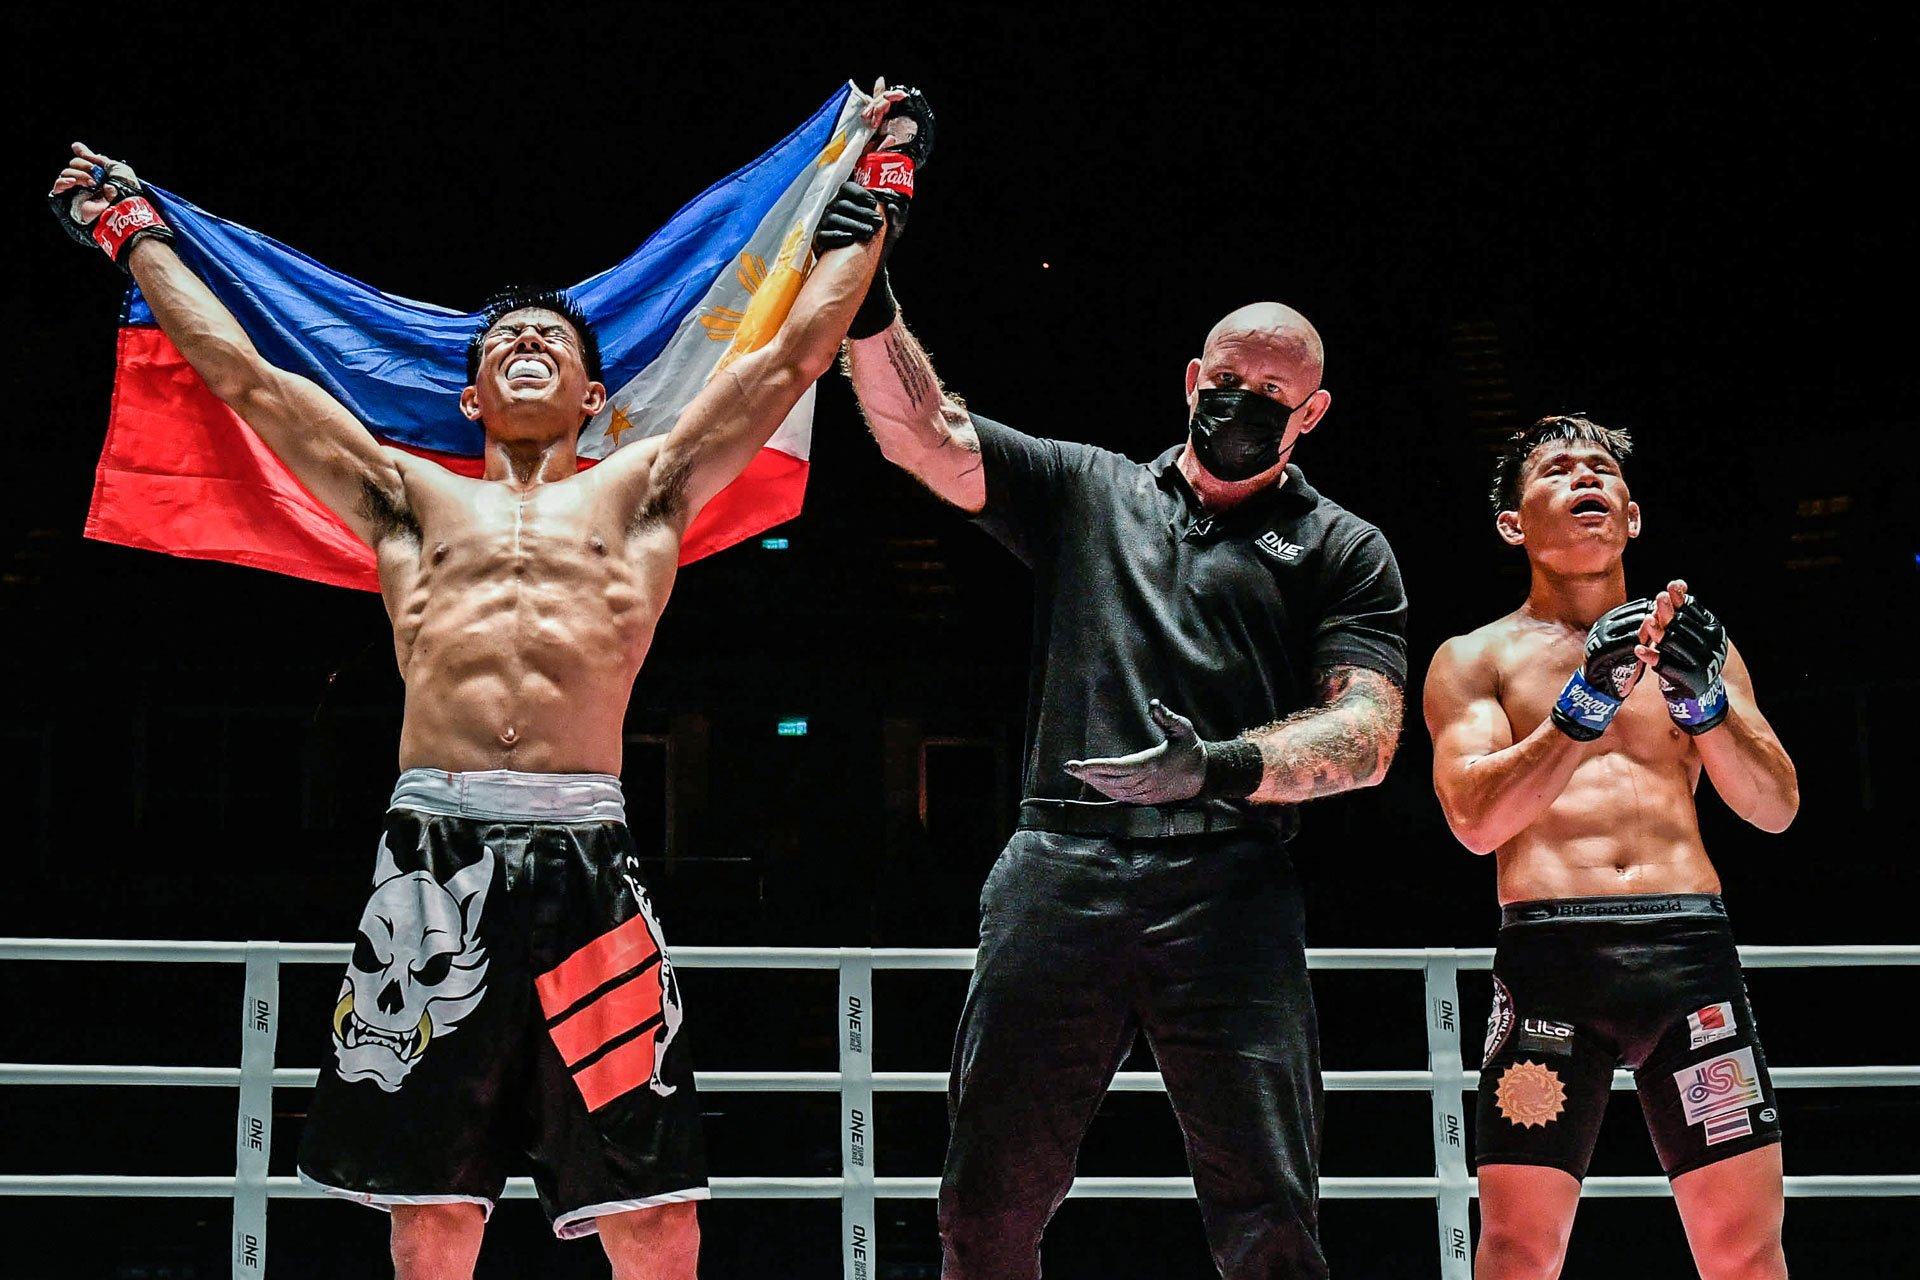 Tiebreaker Times Drex Zamboanga ready for road ahead Mixed Martial Arts News ONE Championship  Toughguys International Drex Zamboanga